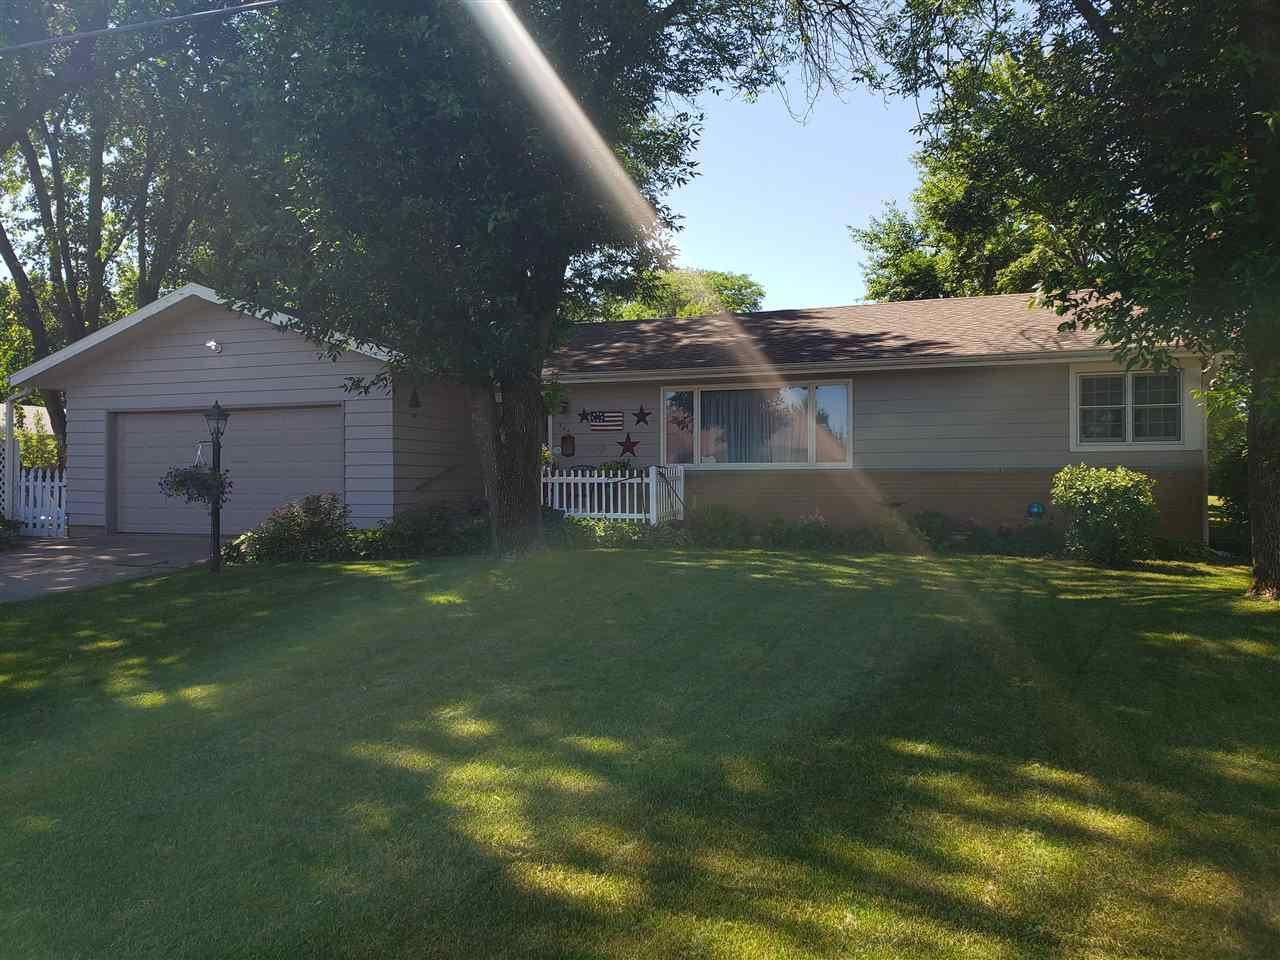 304 E Slifer St, Portage, WI 53901 - MLS#: 1887090